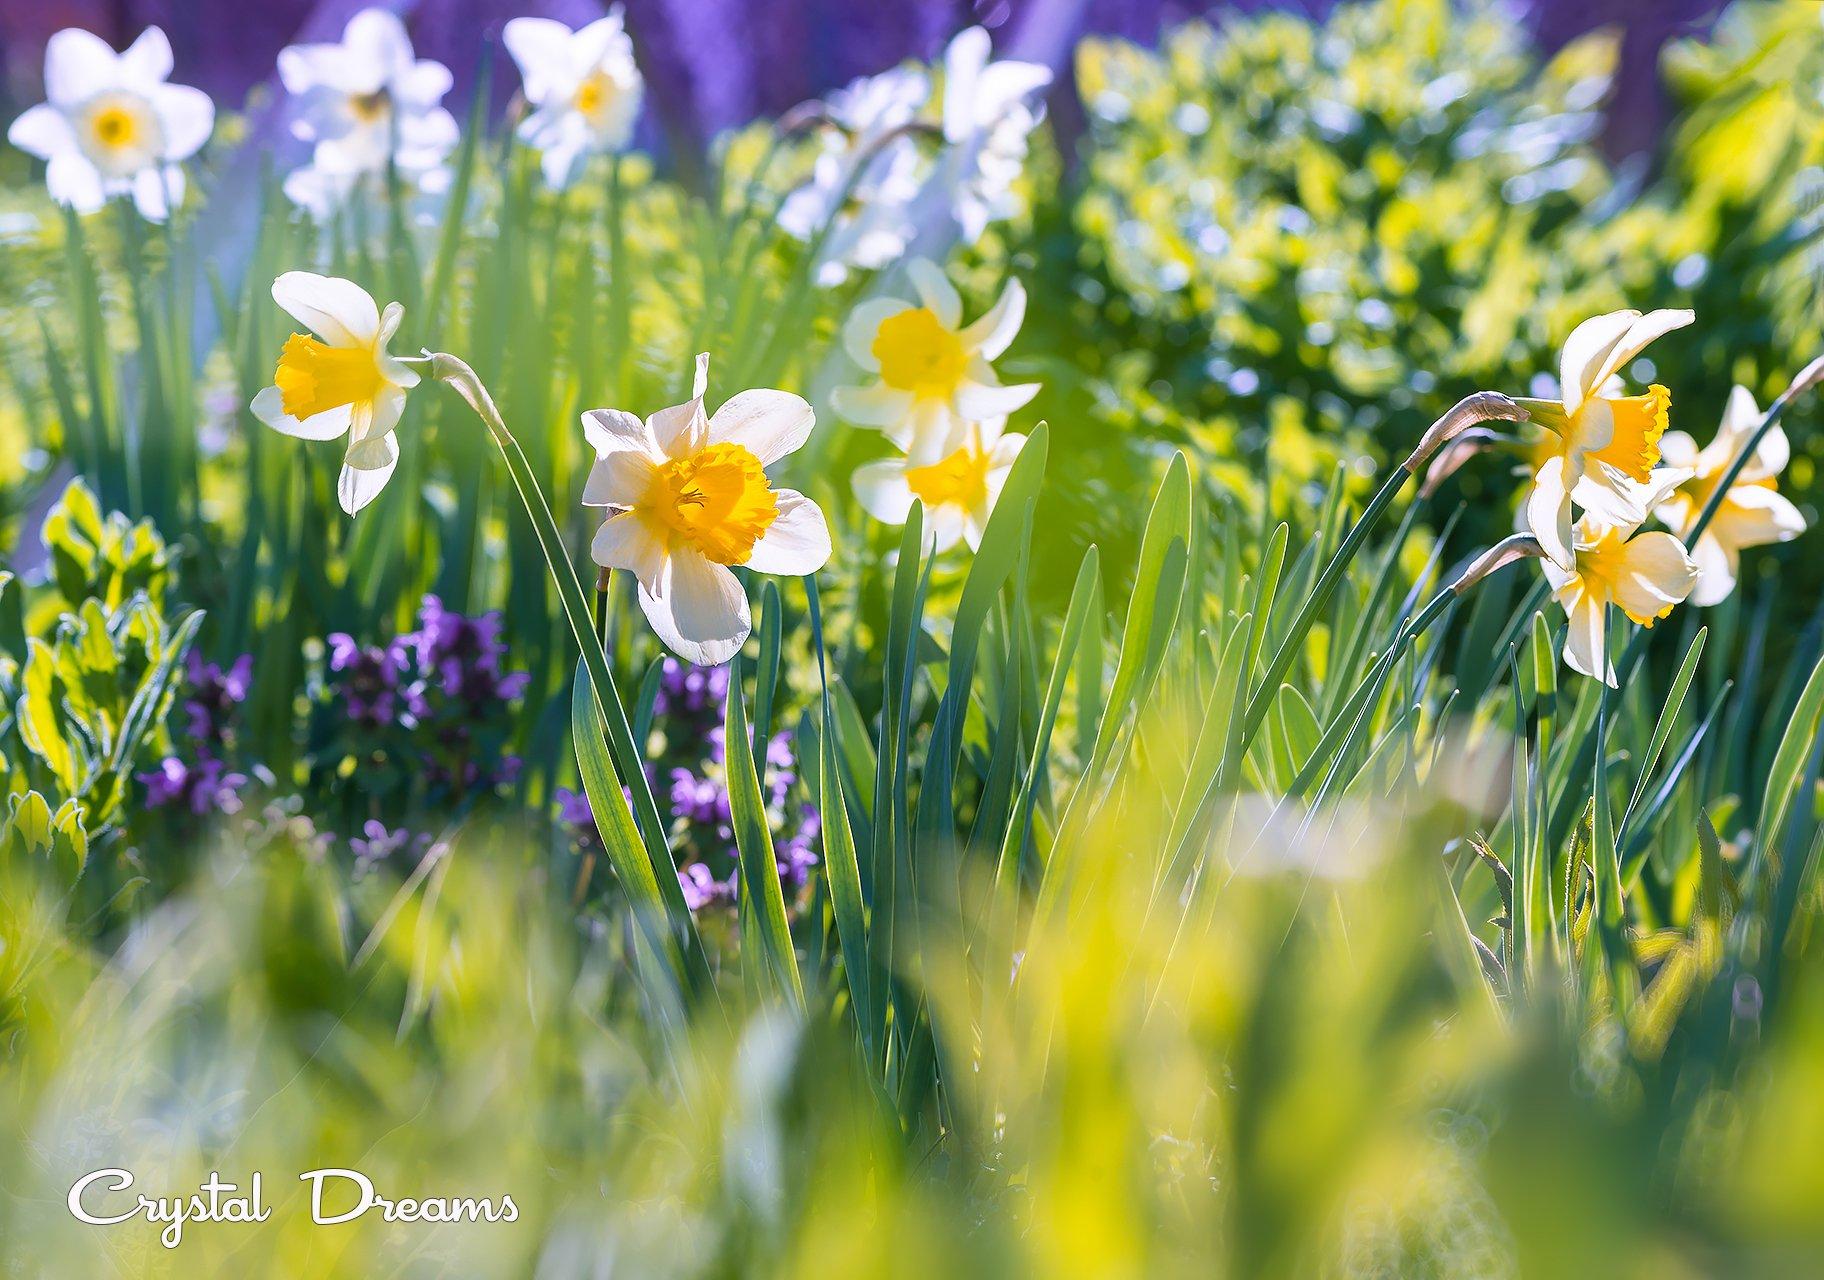 crystal dreams, macro, spring, color, art, nature, flowers, Крылова Татьяна